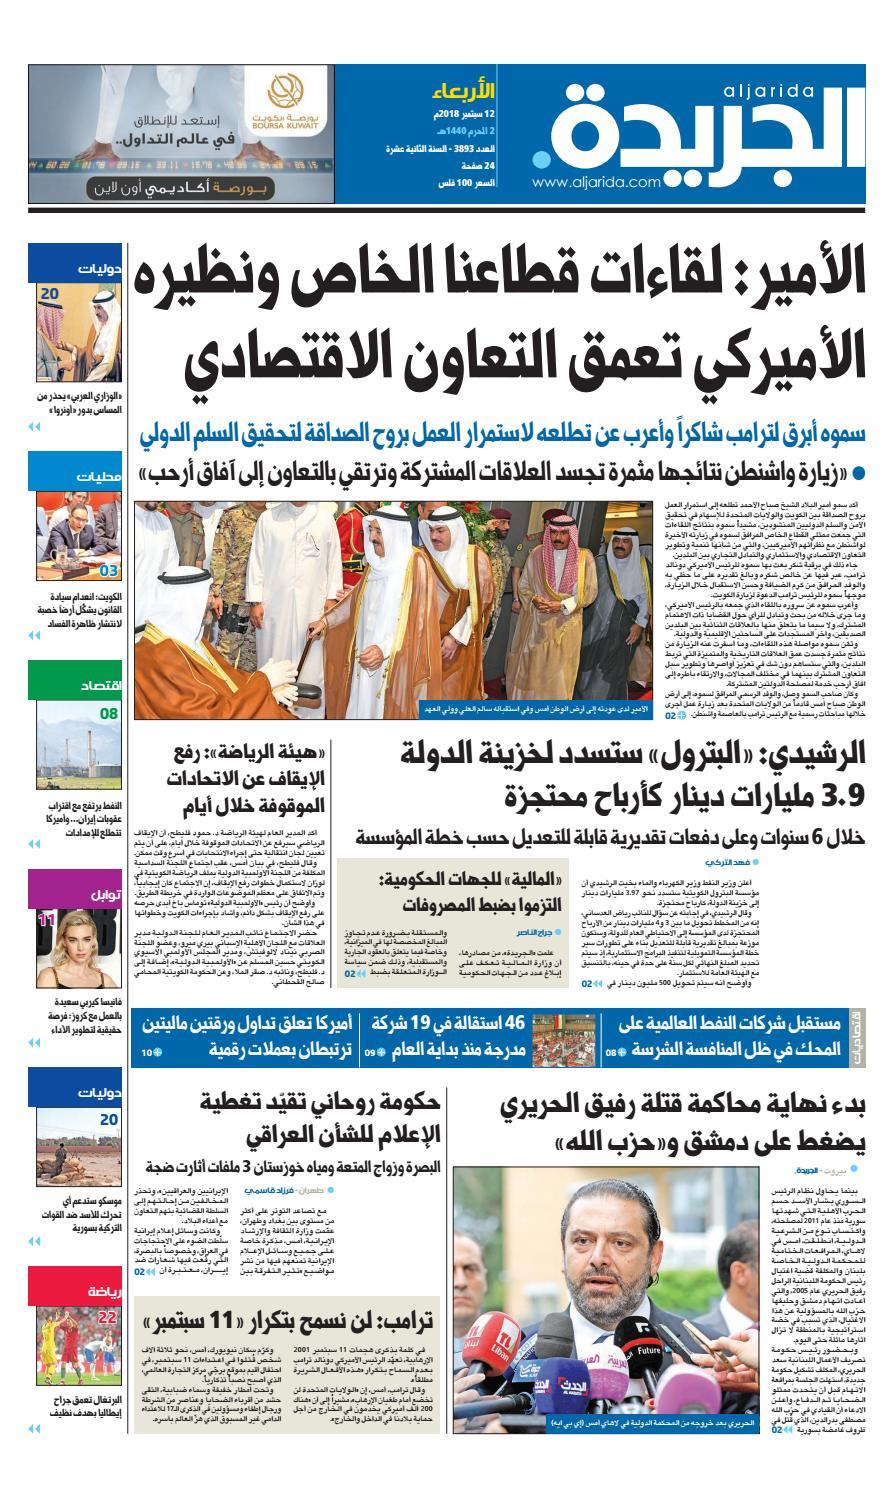 780fc33b04c93 عدد الجريدة الاربعاء 12 سبتمبر 2018 by Aljarida Newspaper - issuu